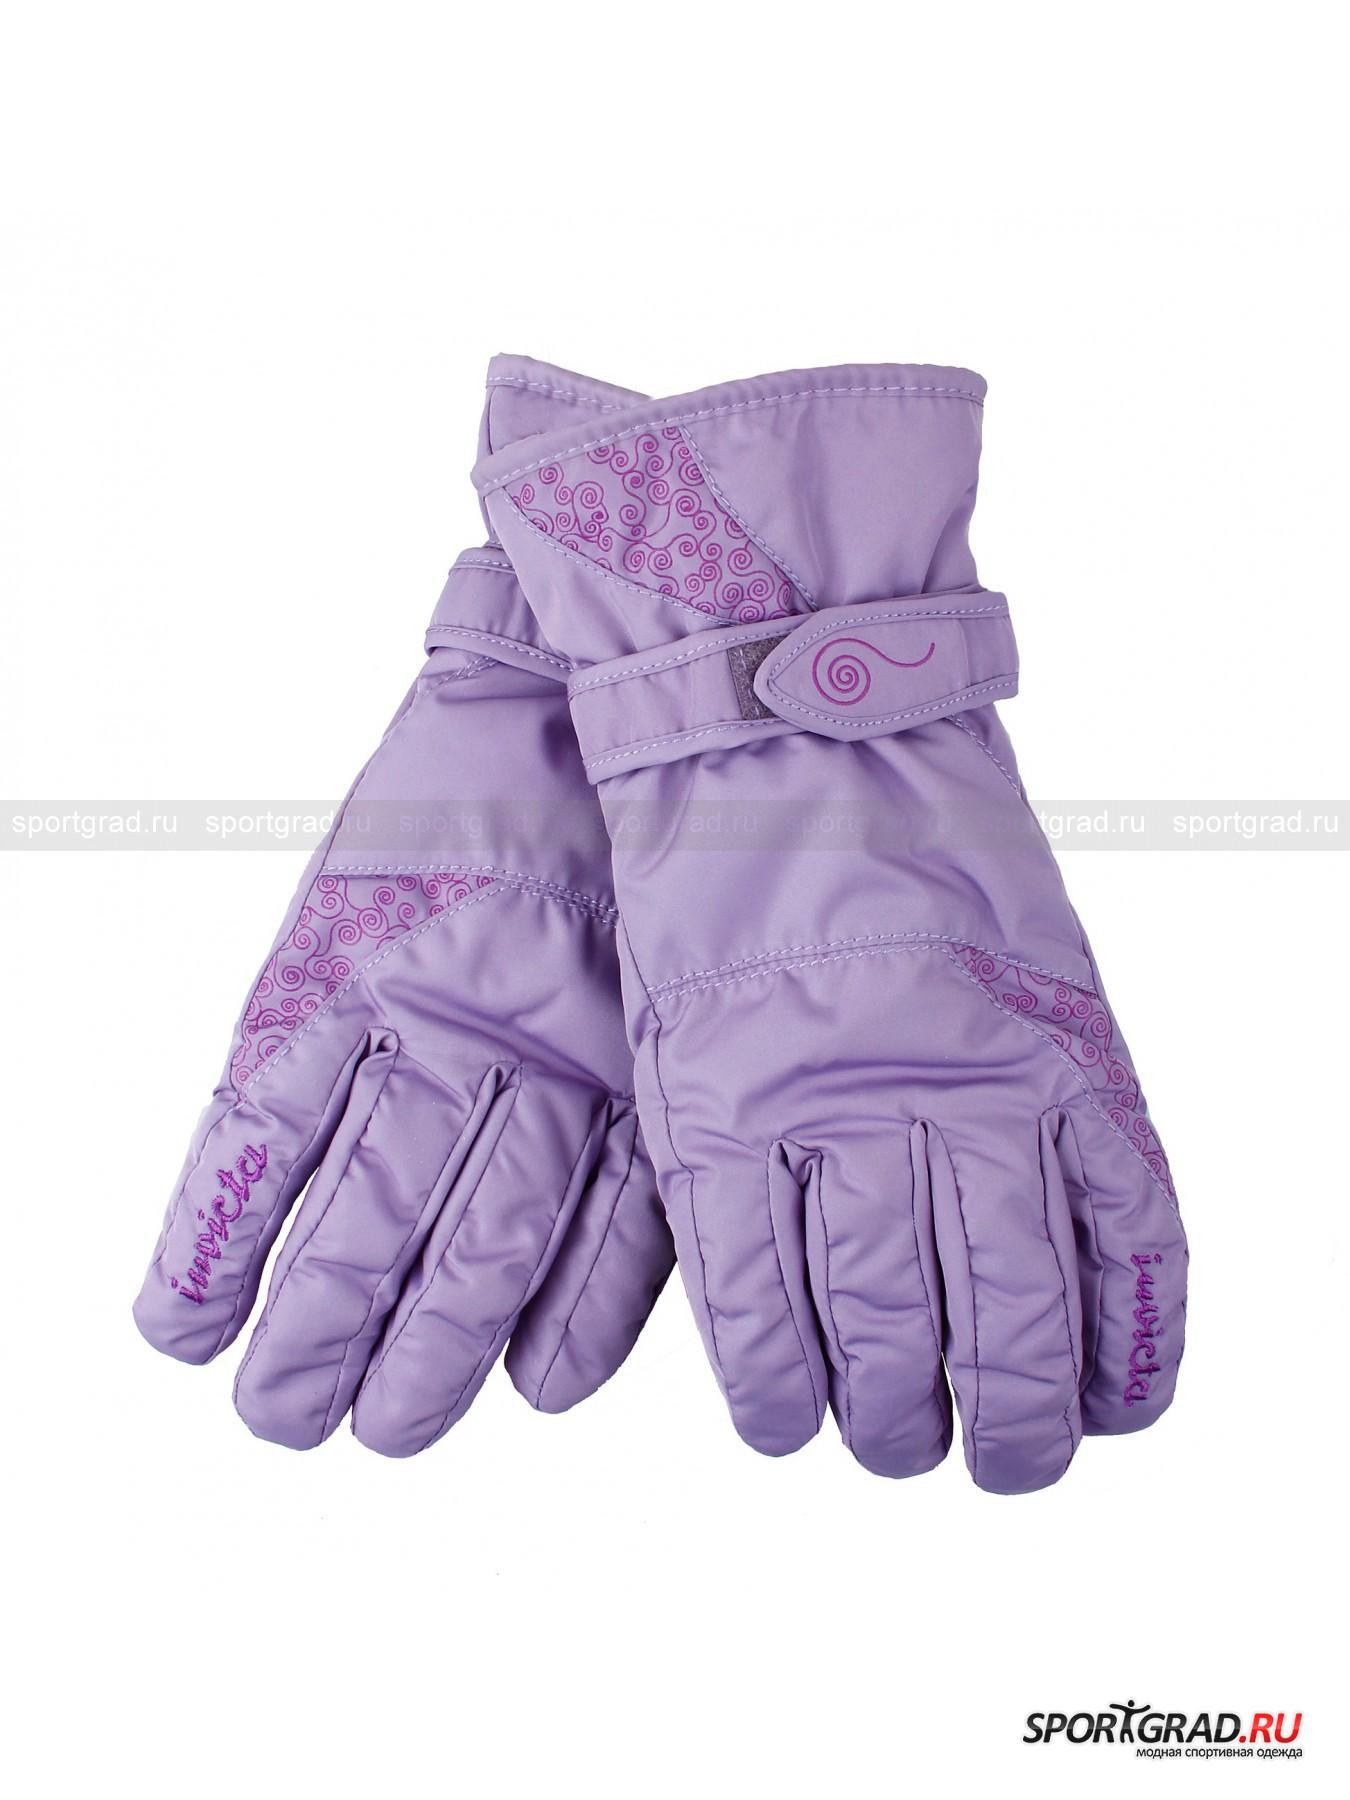 Перчатки женские Saphire lady INVICTA от Спортград